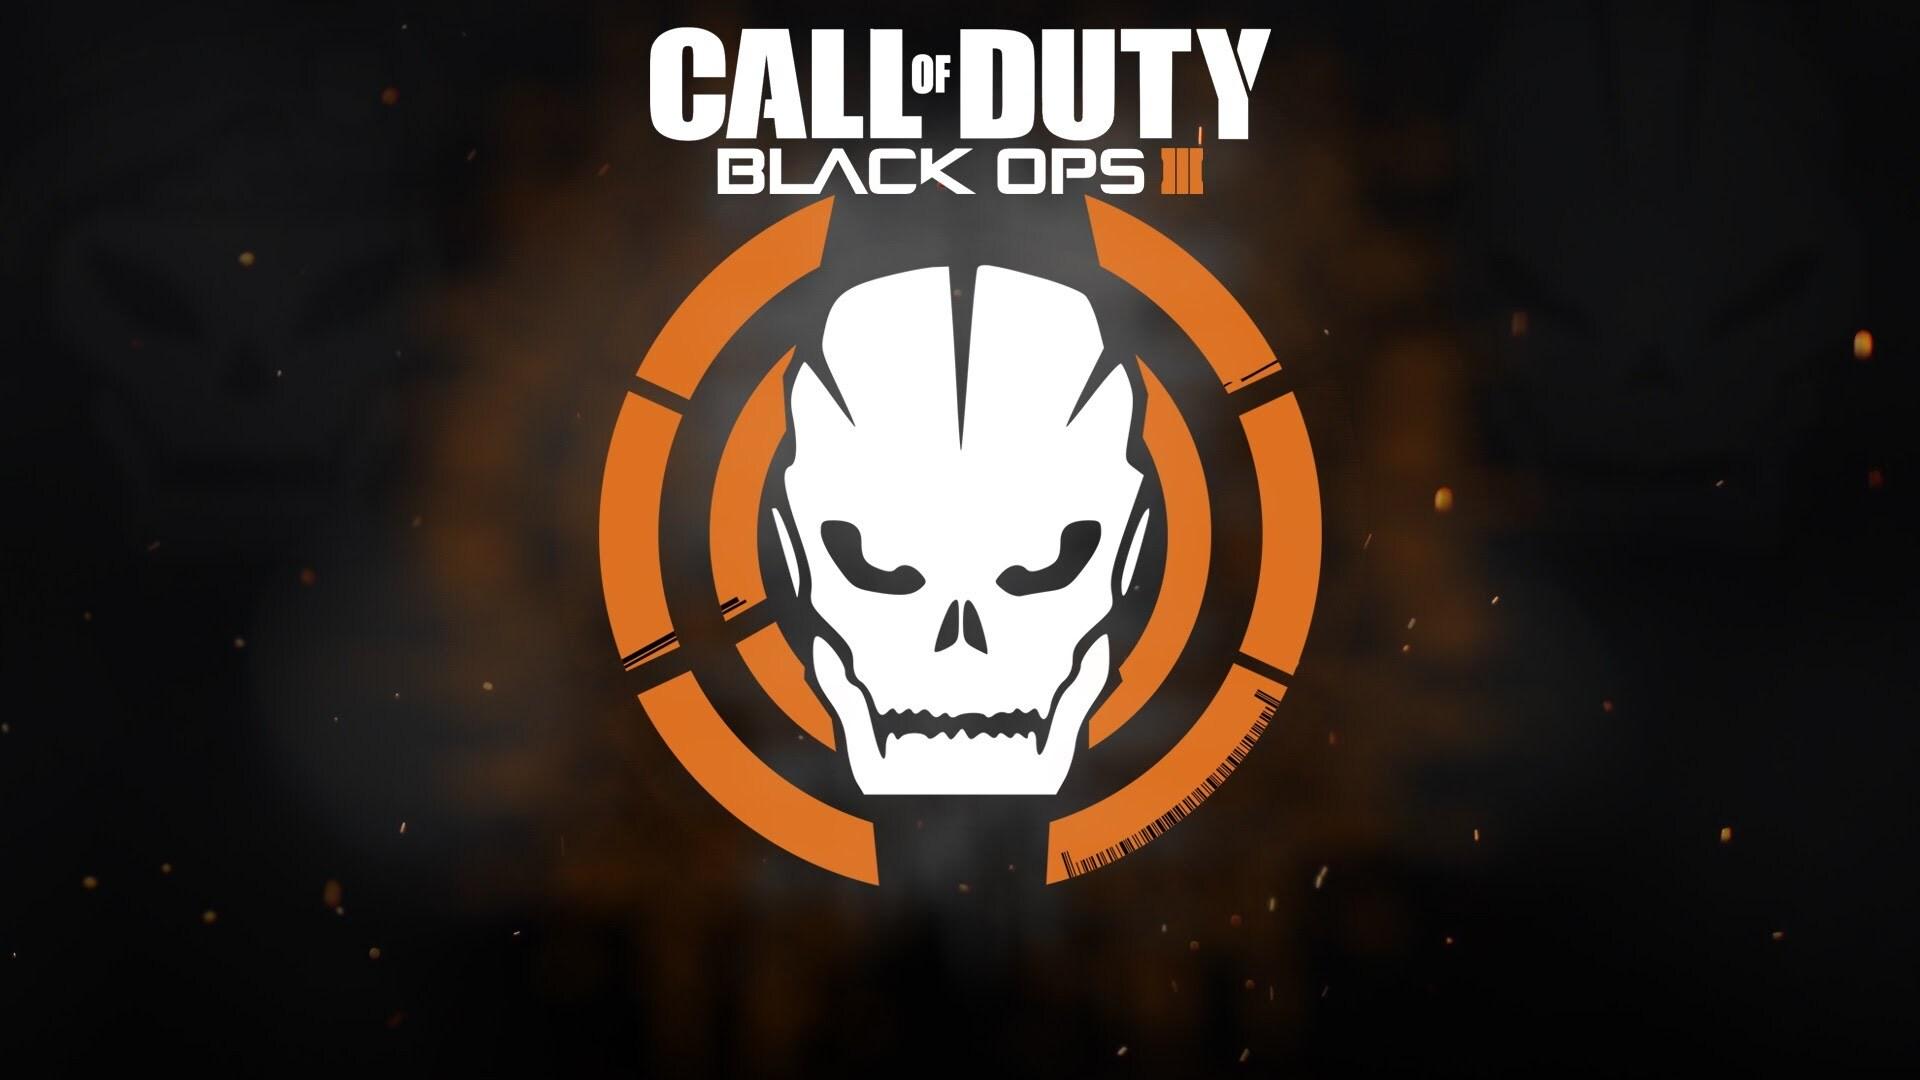 1920x1080 Hd Call Of Duty Black Ops 3 Laptop Full Hd 1080p Hd 4k